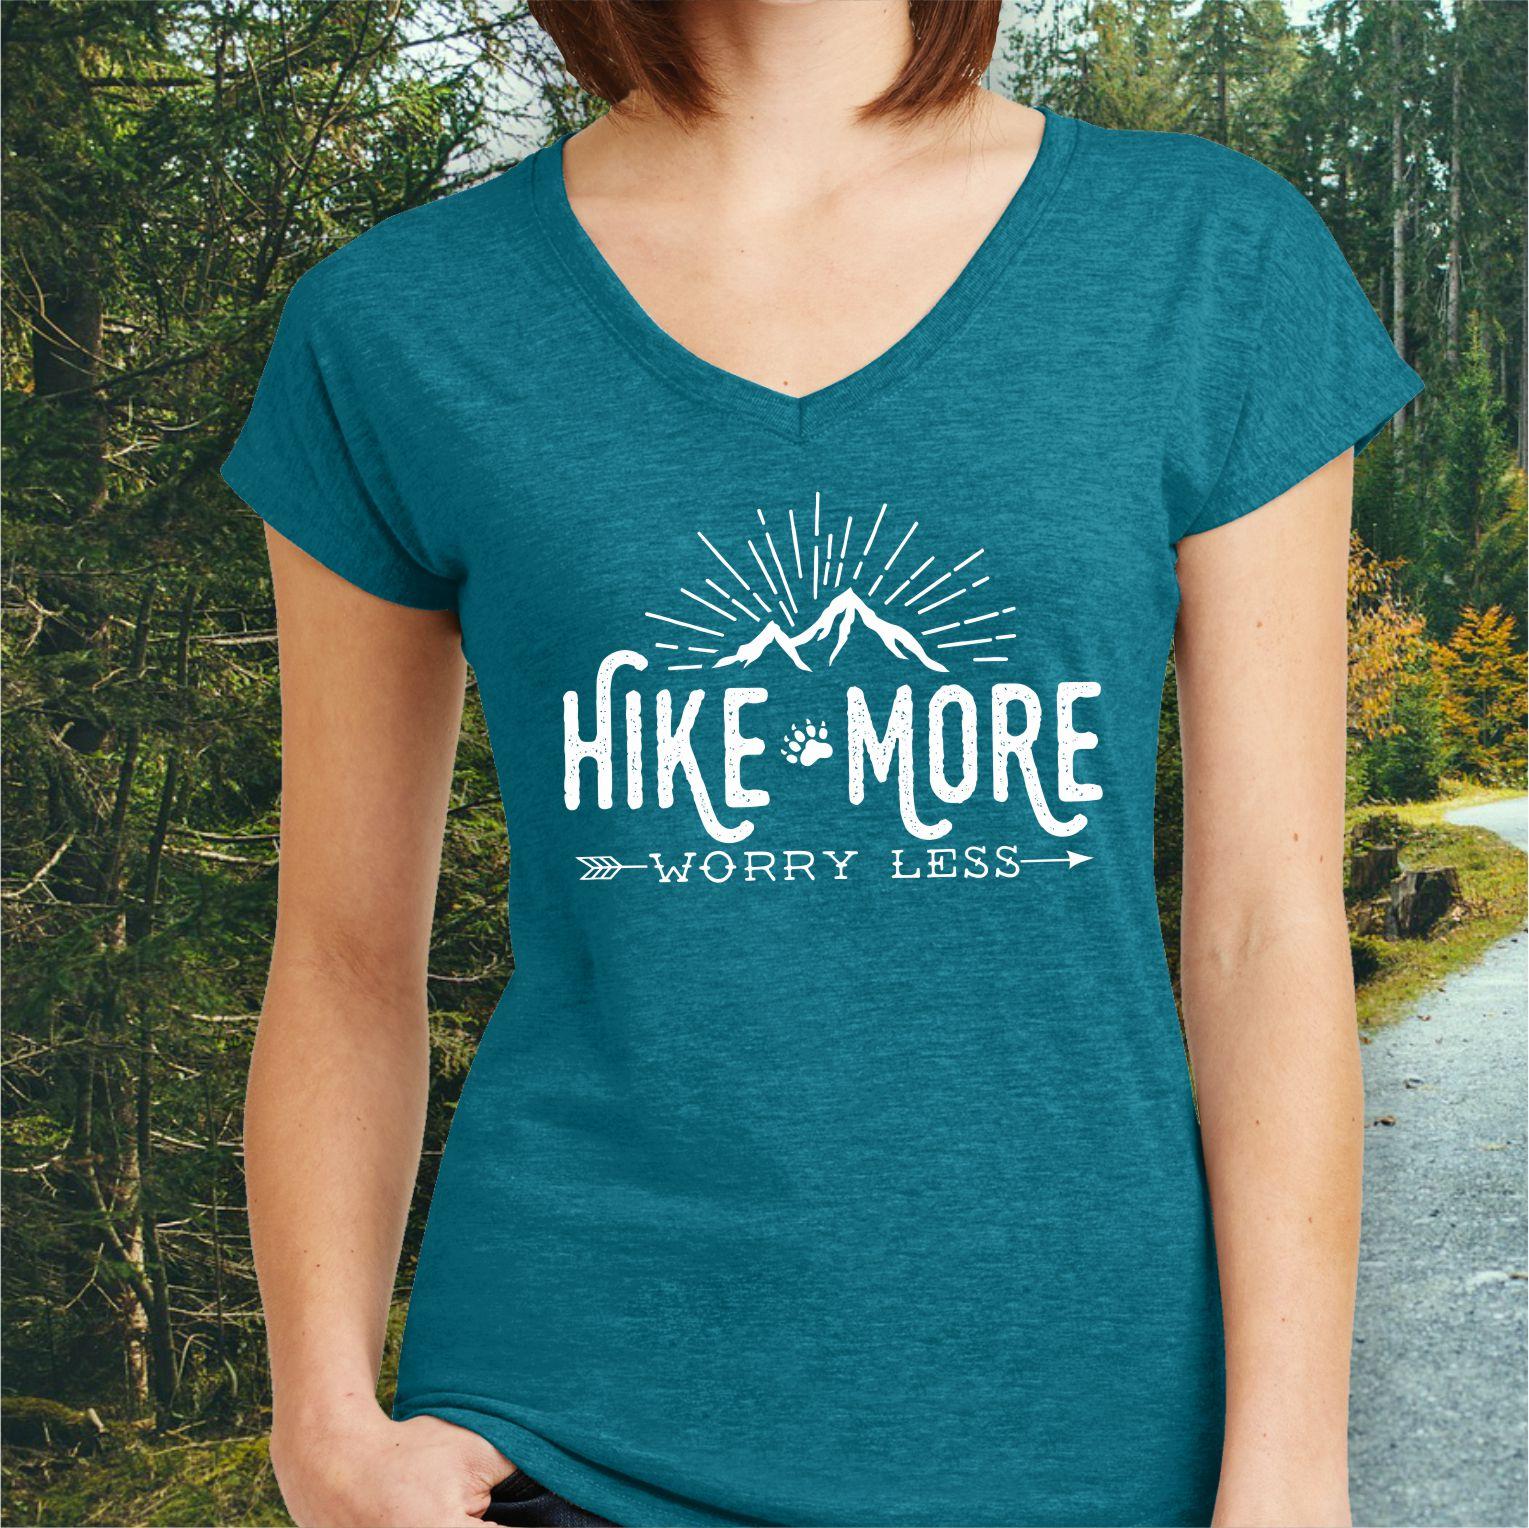 Ladies-Hiking-Shirt-Hike-More-Worry-Less